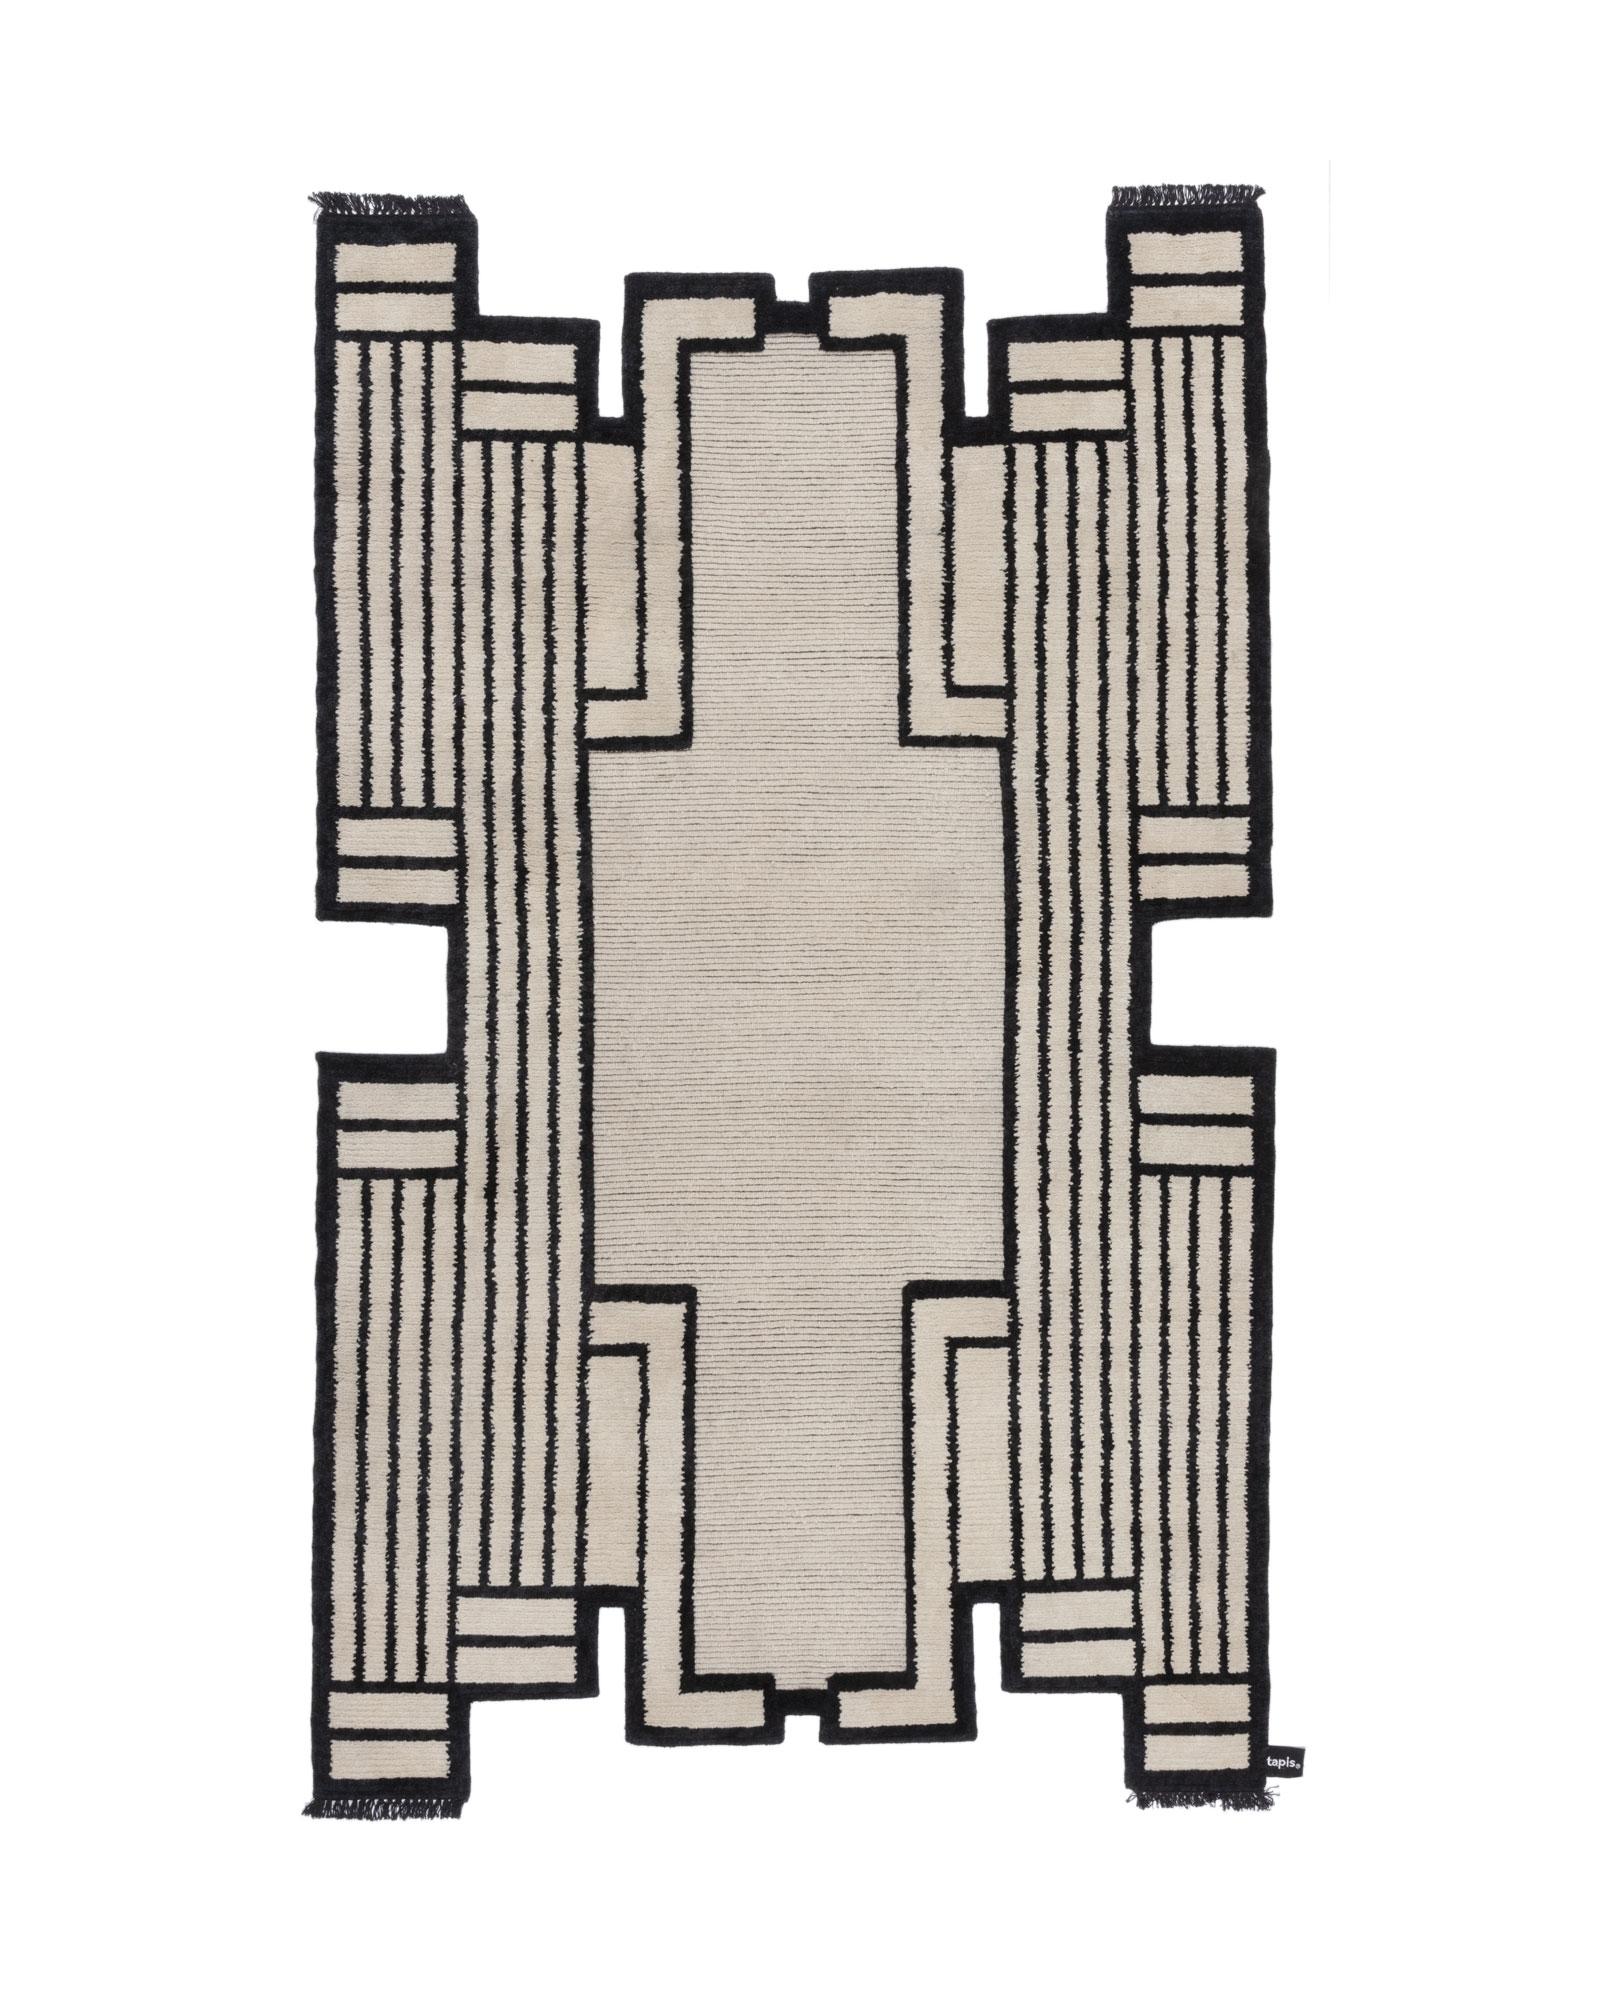 Asmara designed by Federico Pepe